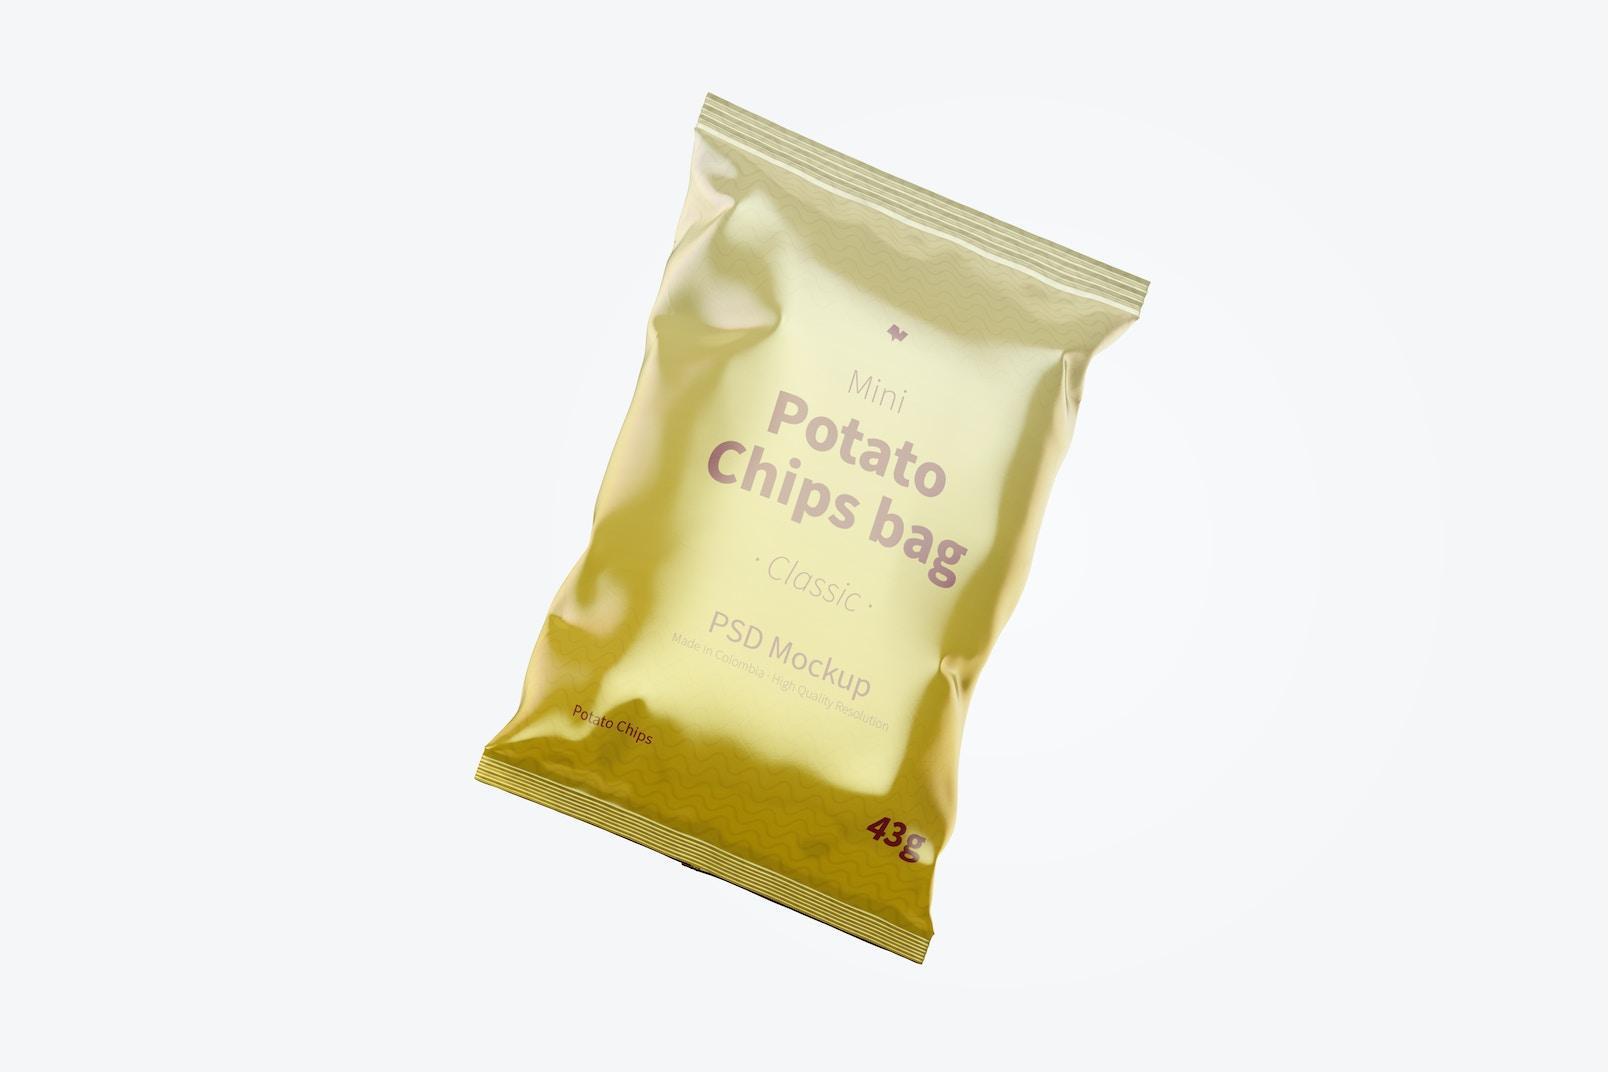 Glossy Mini Potato Chips Bag Mockup